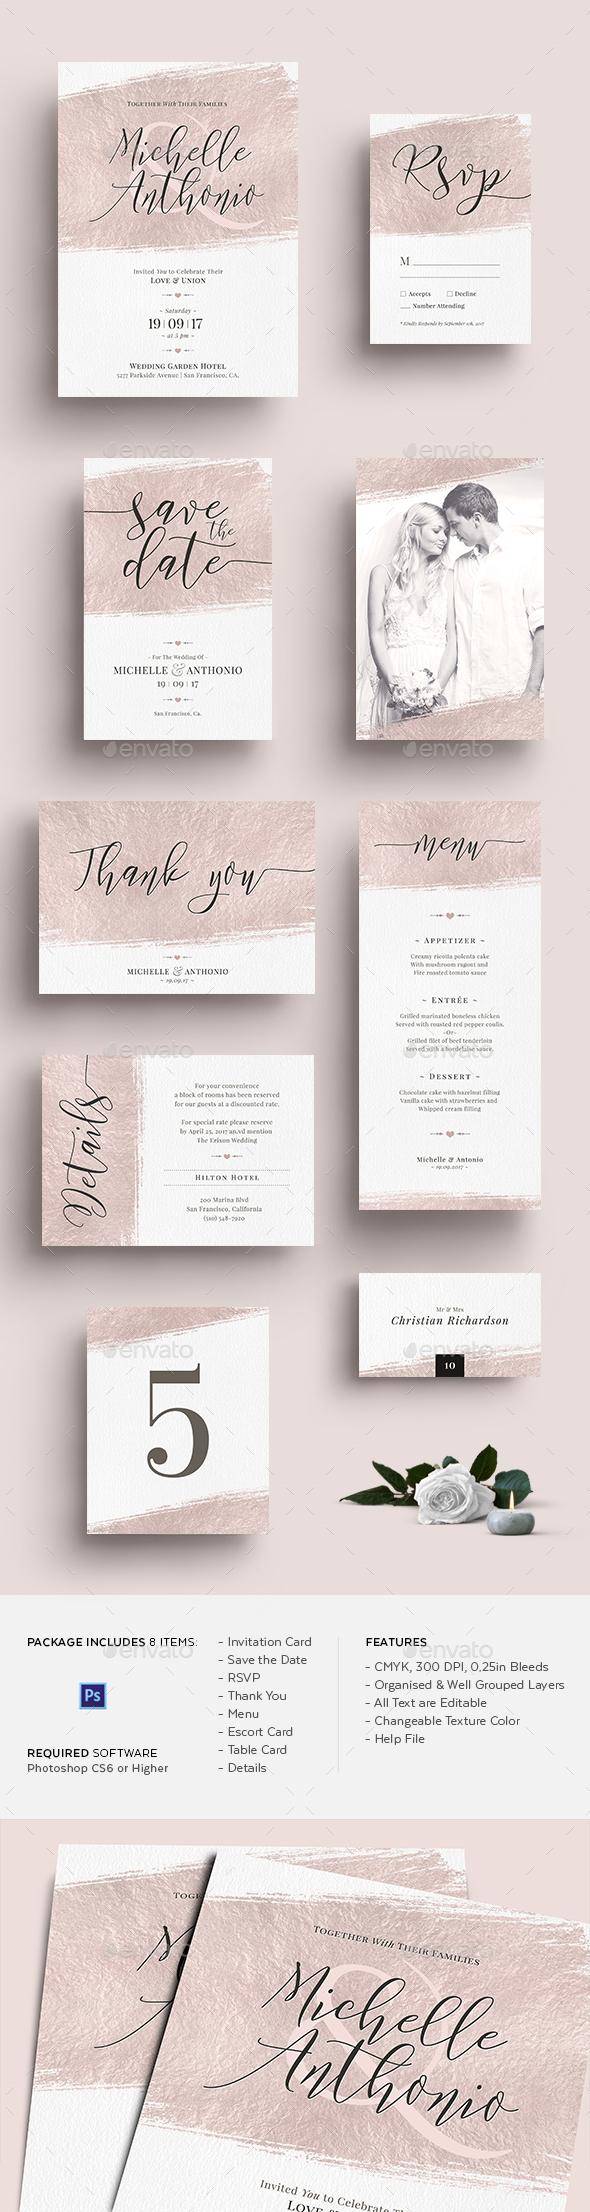 Foil Wedding Invitation Set - Wedding Greeting Cards